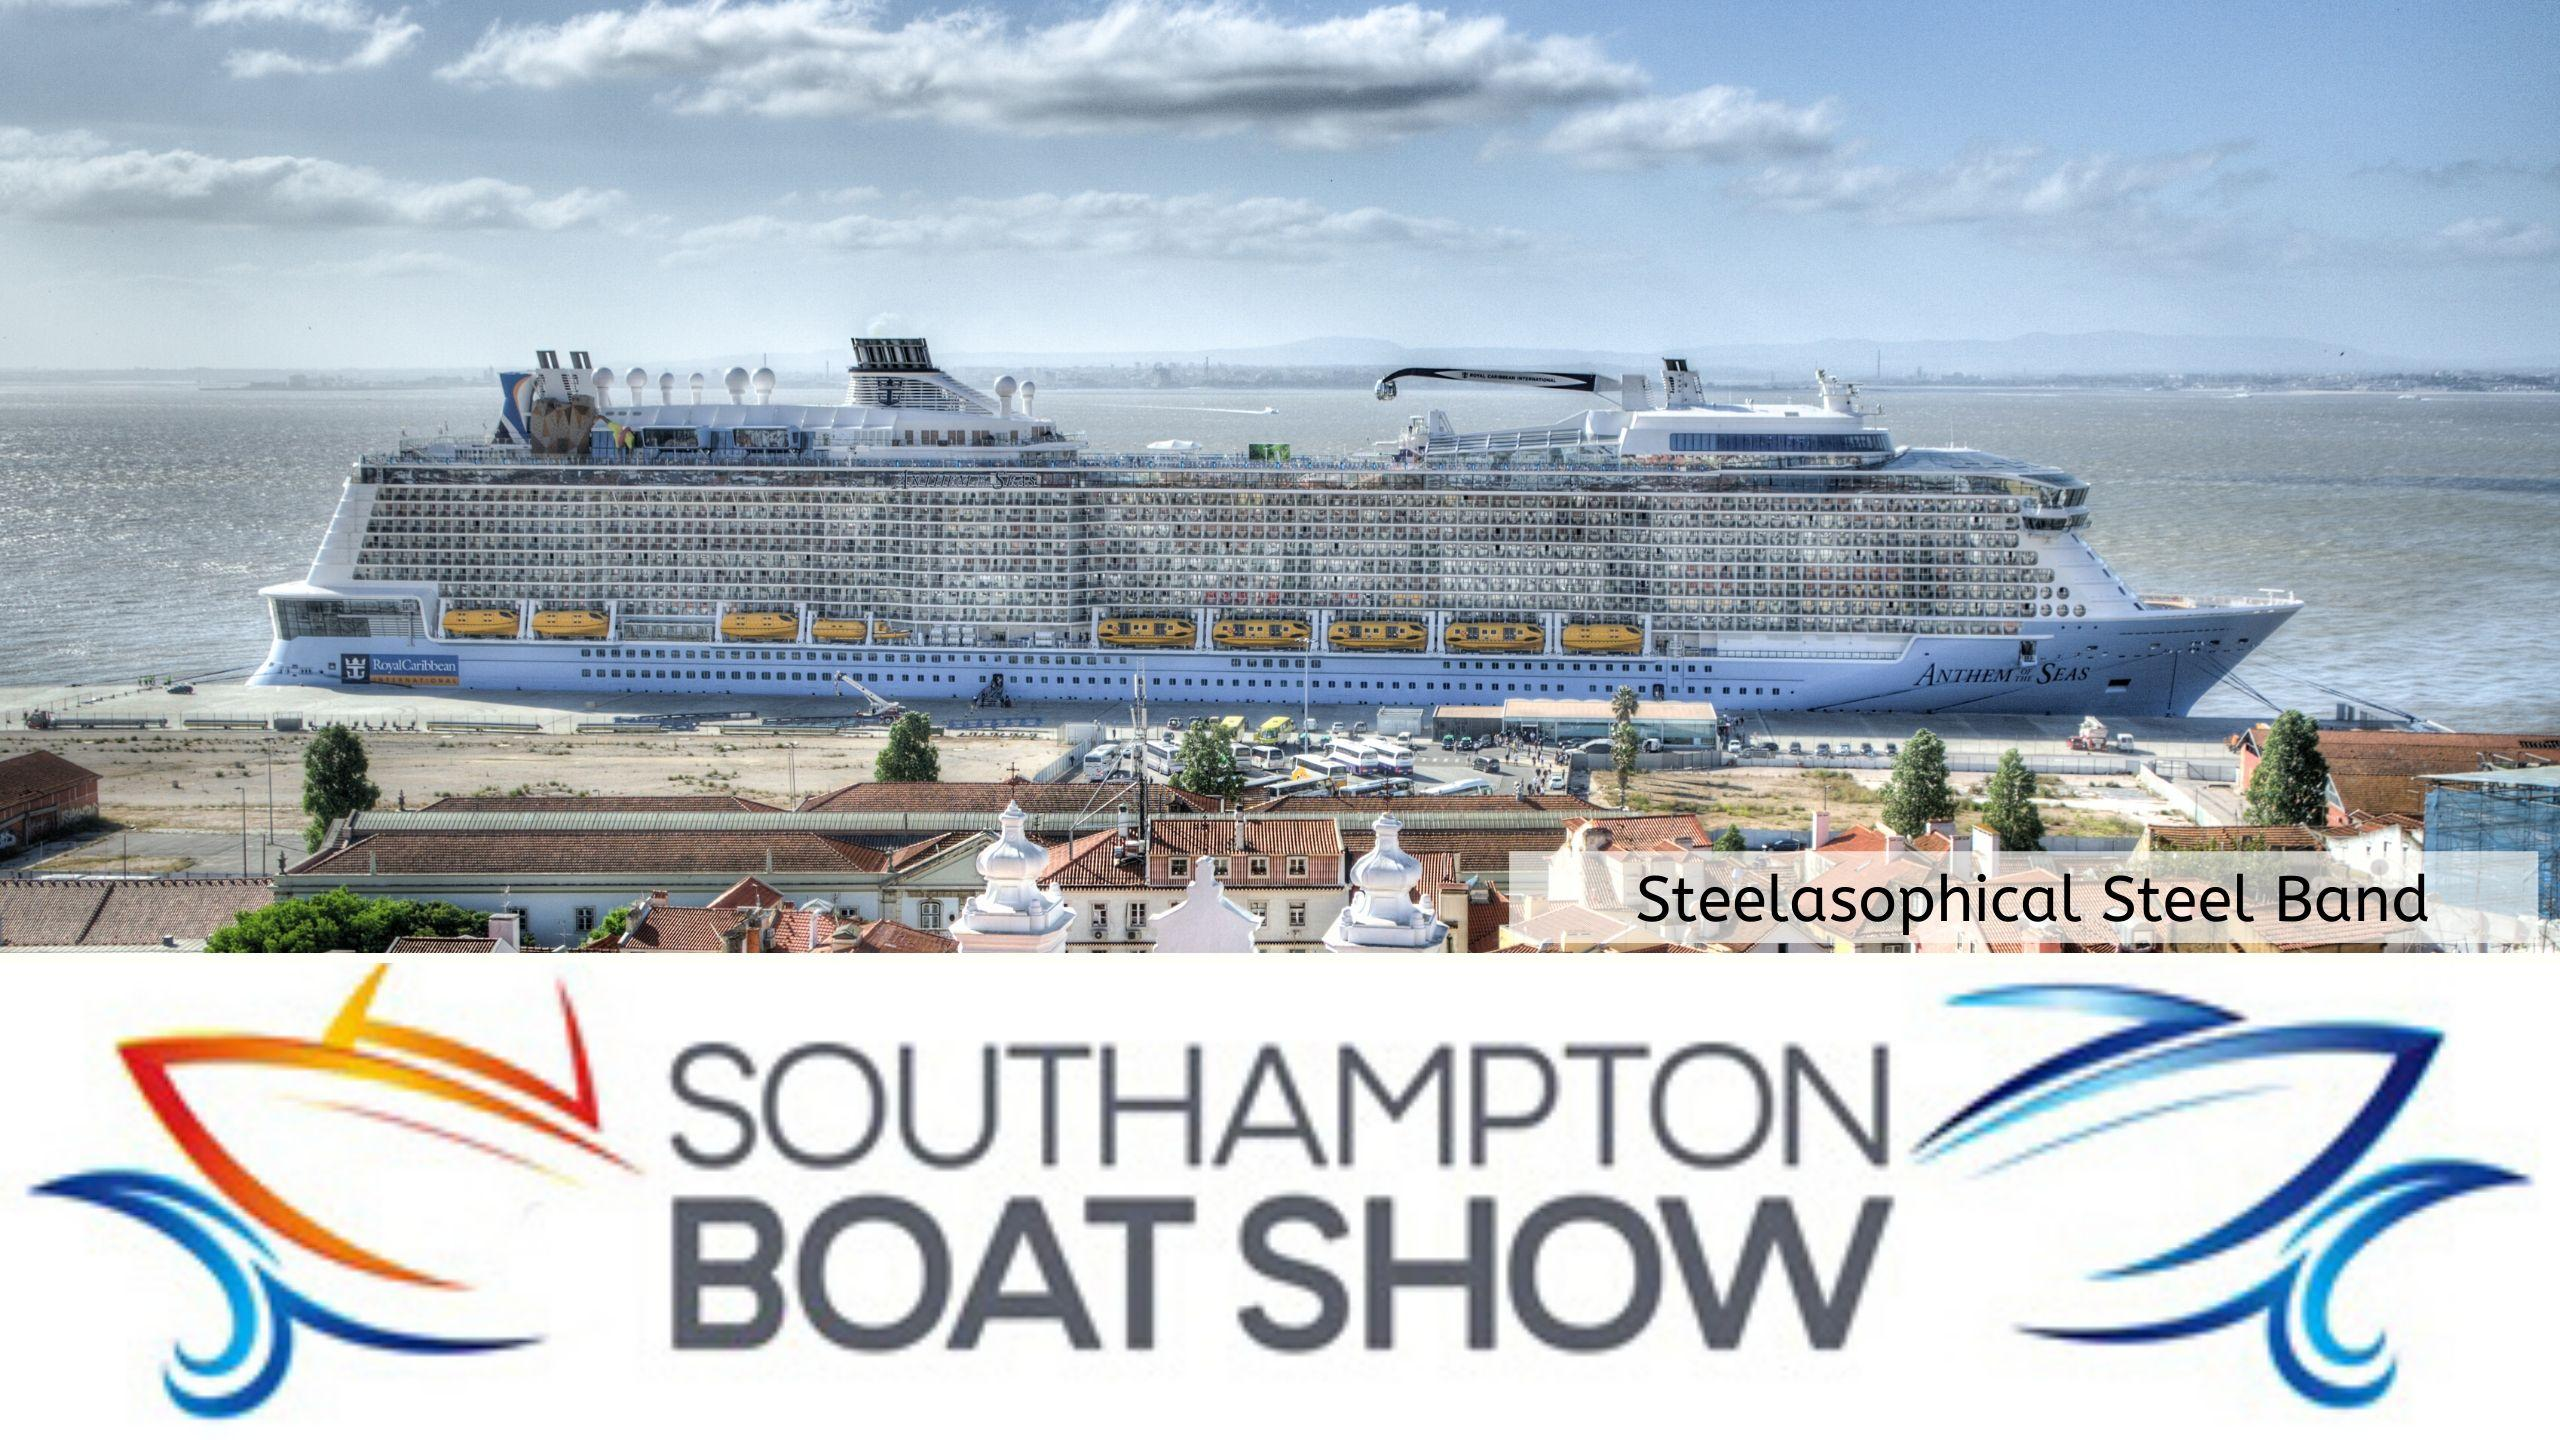 Steelasophical Steel Band Southampton Boat Show Yacht Market RF